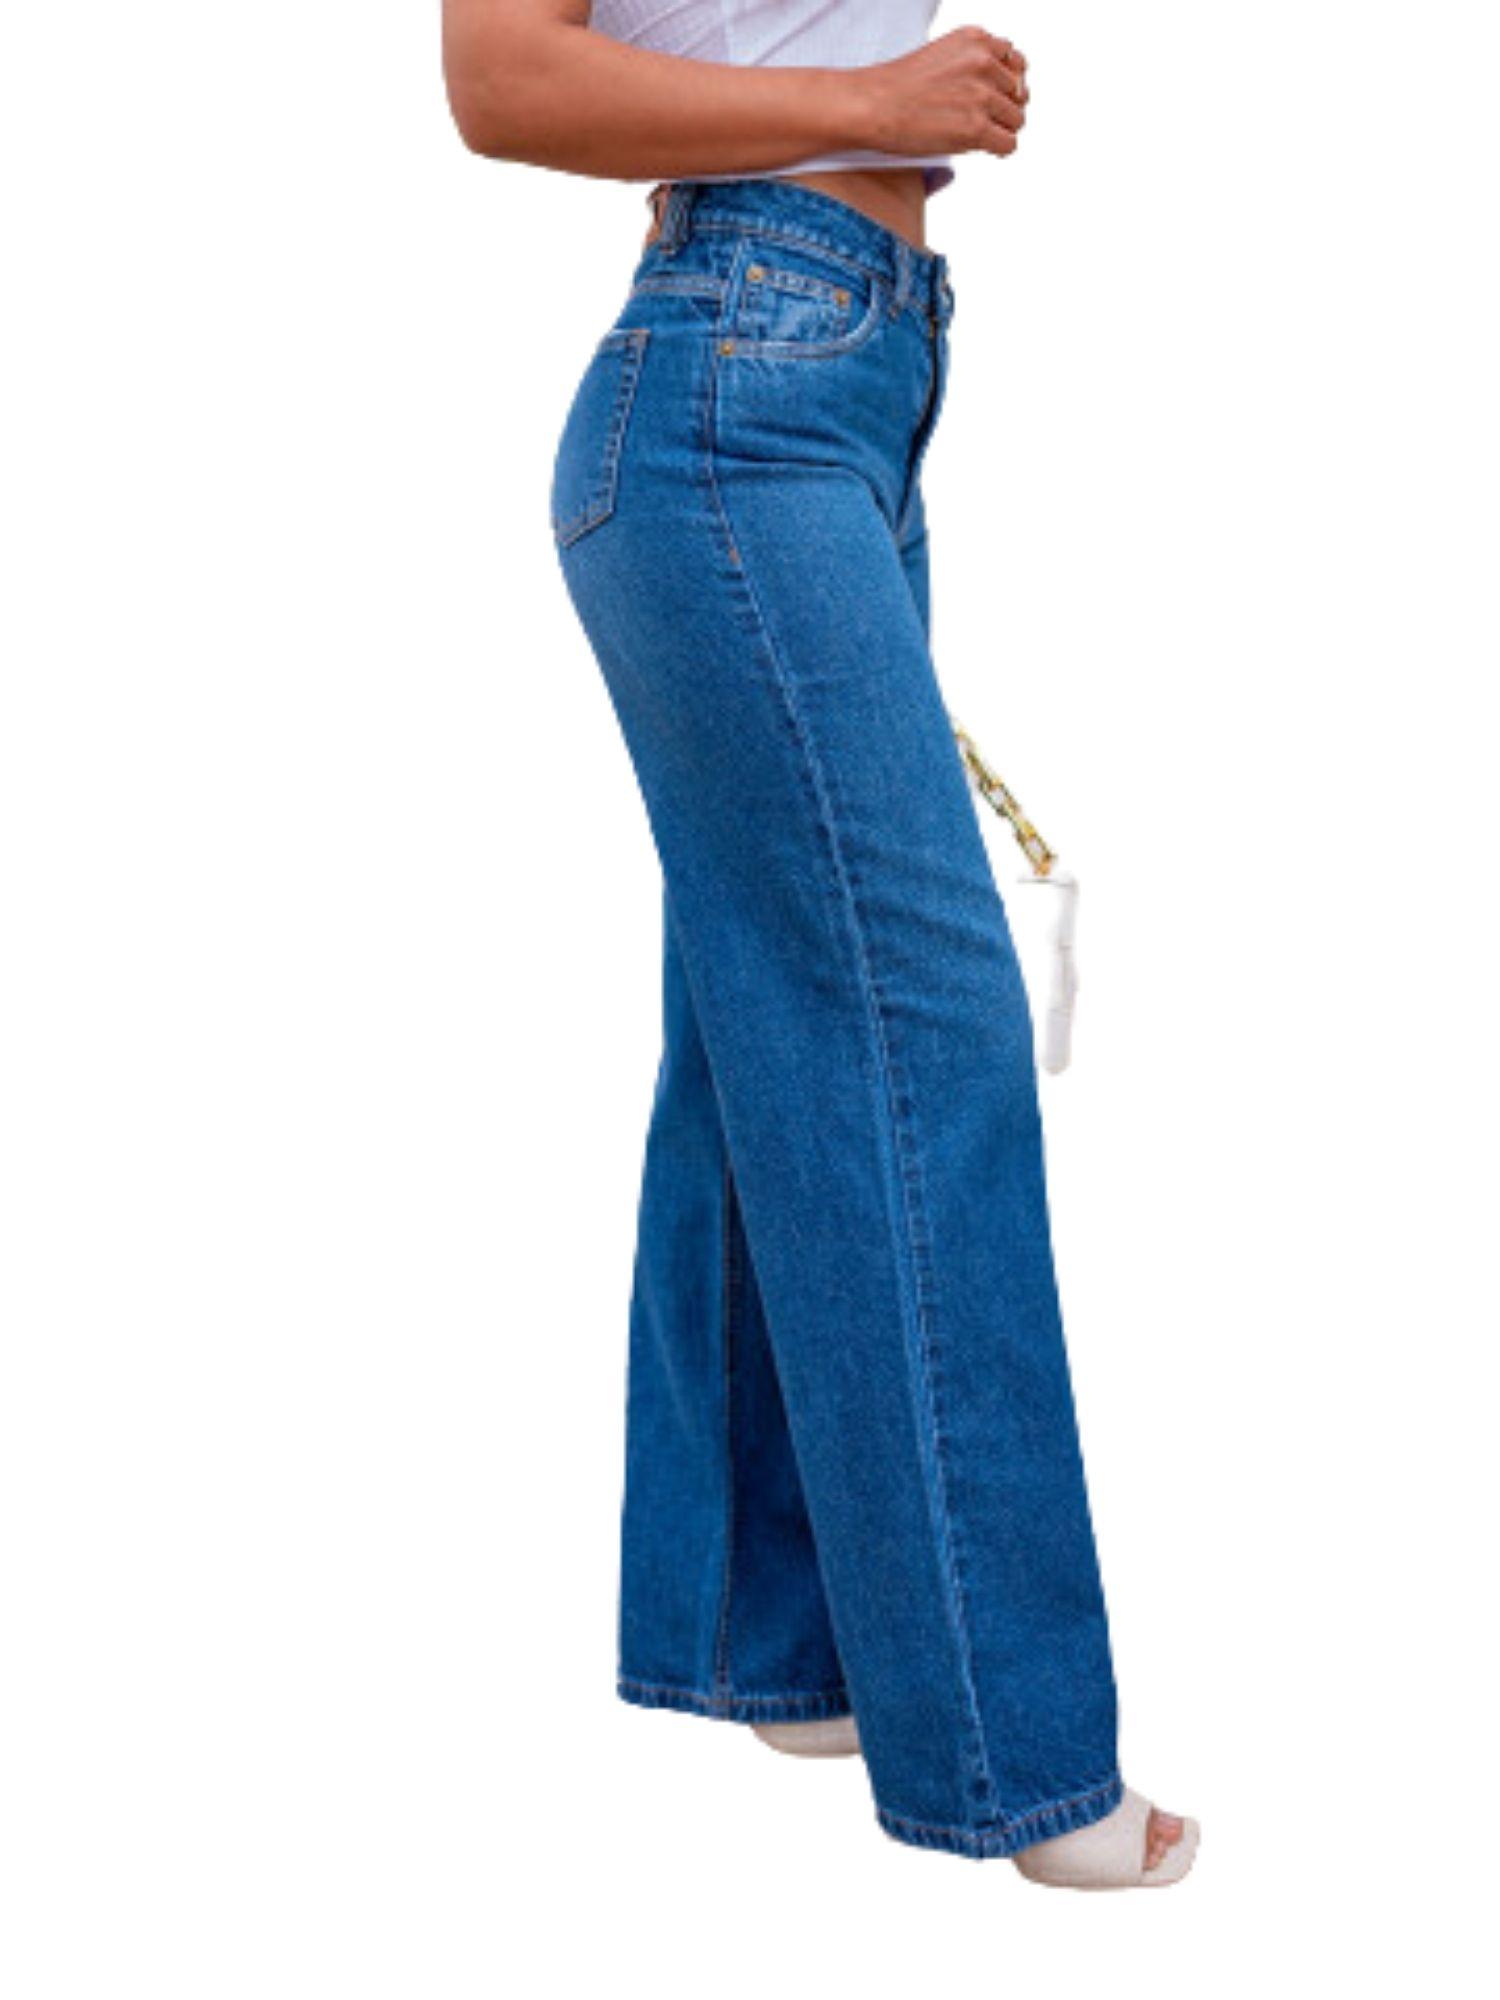 Calça Feminina Wide Leg Revanche  200010